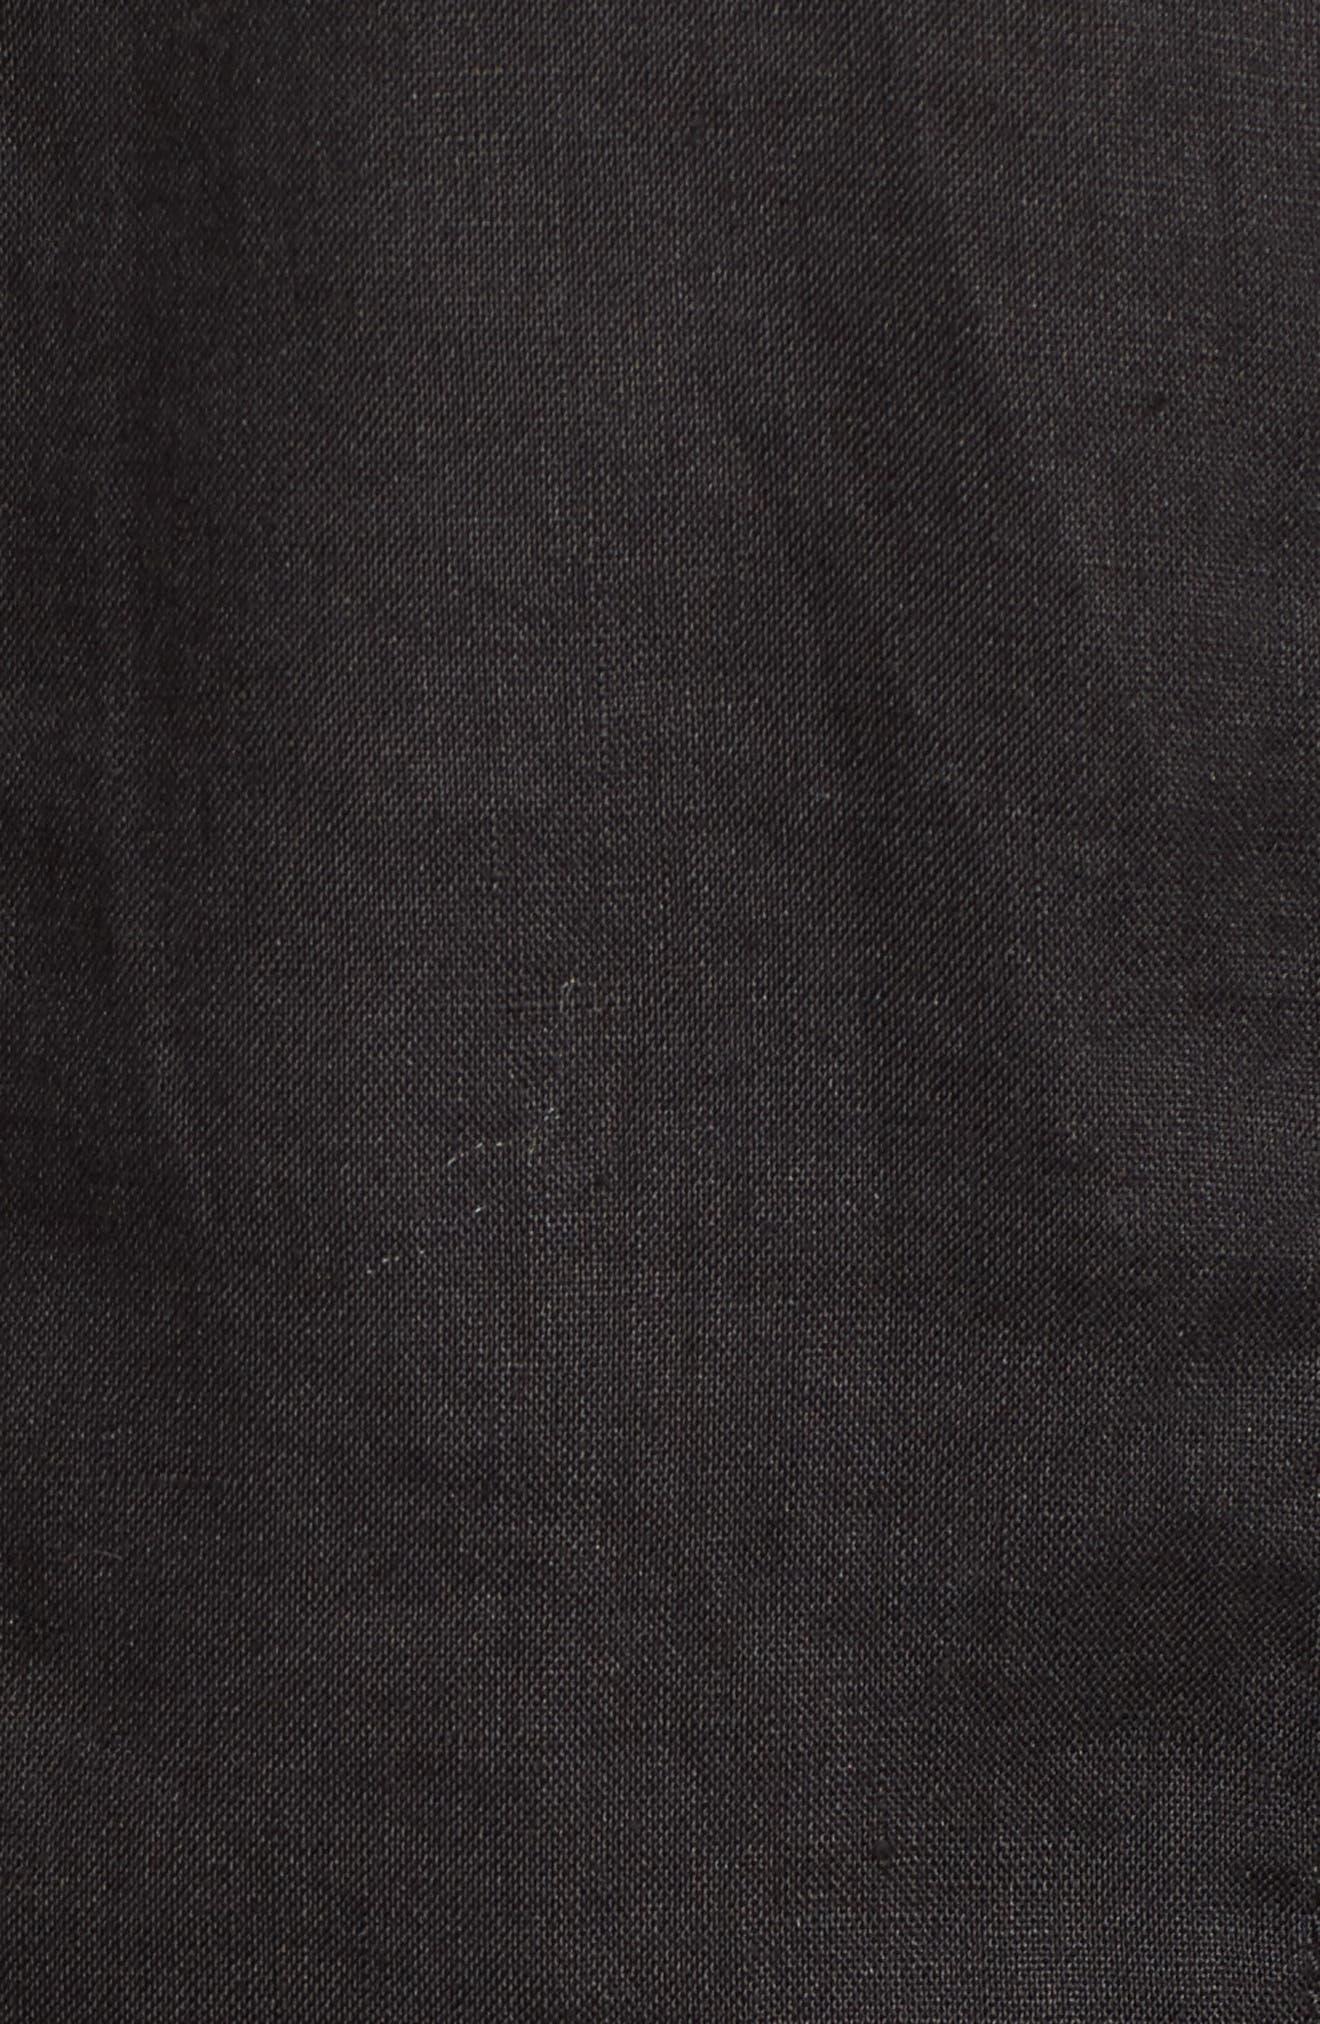 Crop Organic Linen Jacket,                             Alternate thumbnail 5, color,                             Black